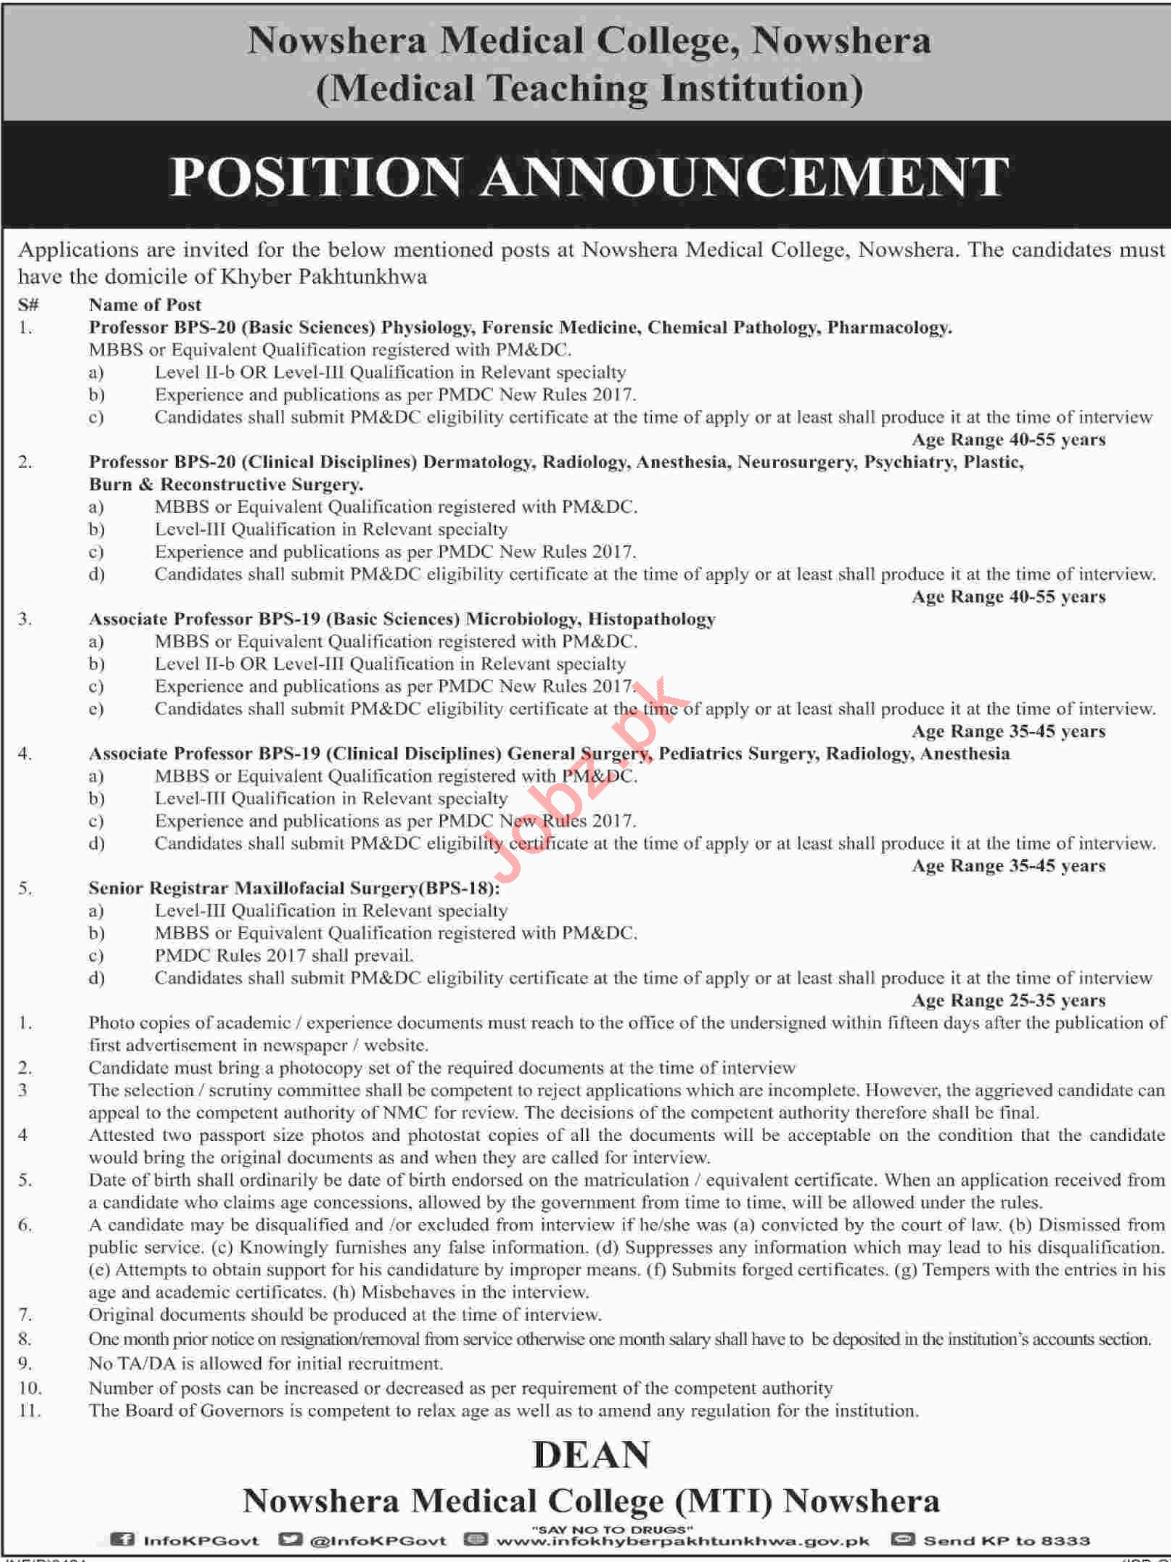 Nowshera Medical College NMC Nowshera Jobs 2018